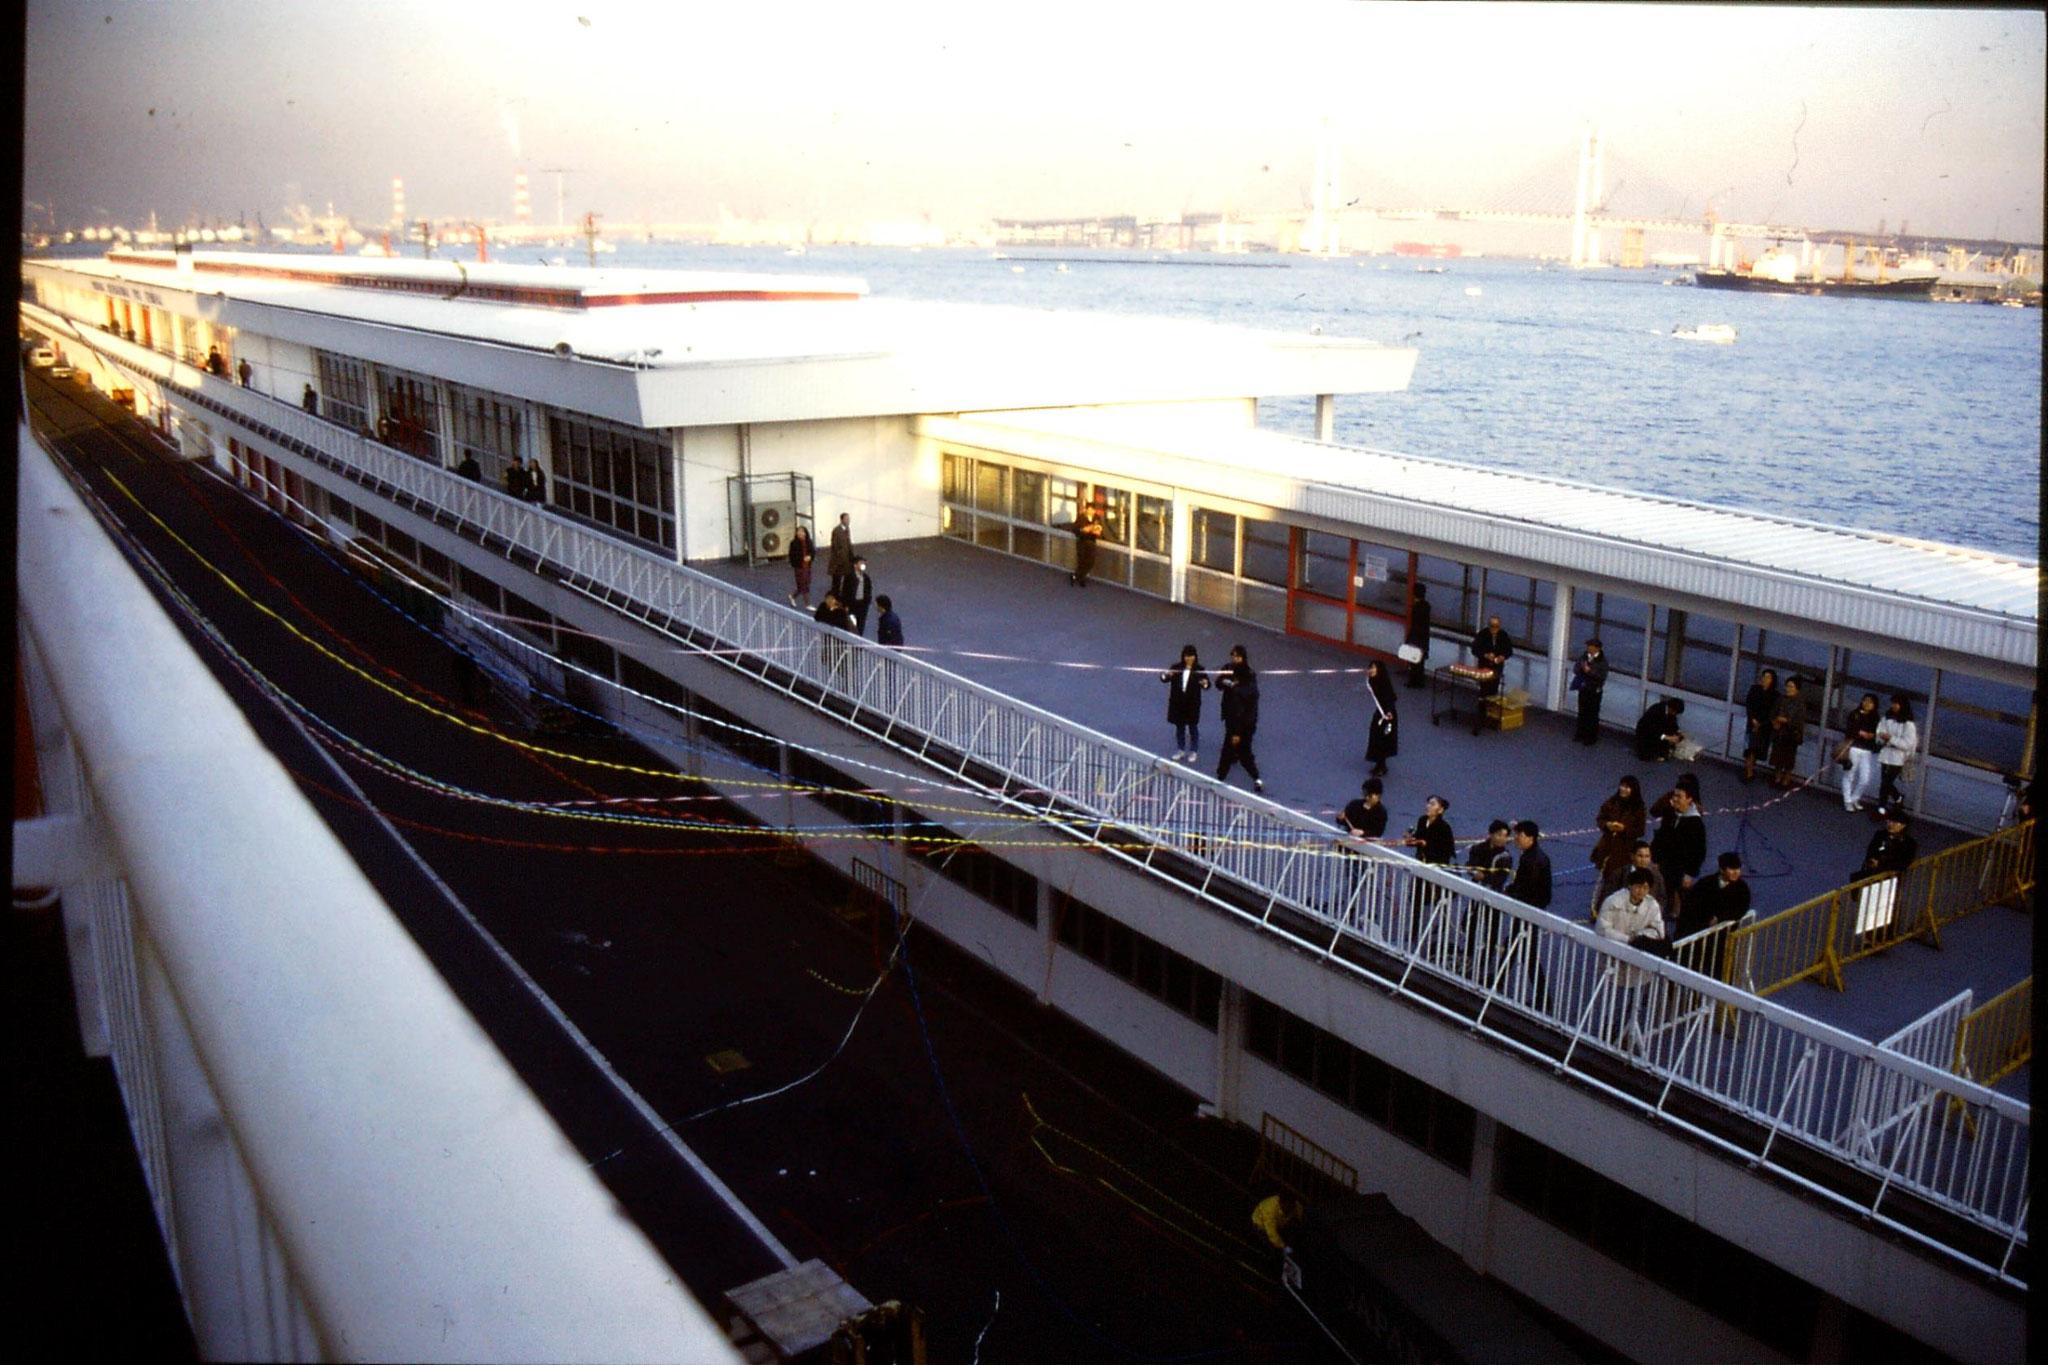 6/2/1989: 22: Yokohama quay